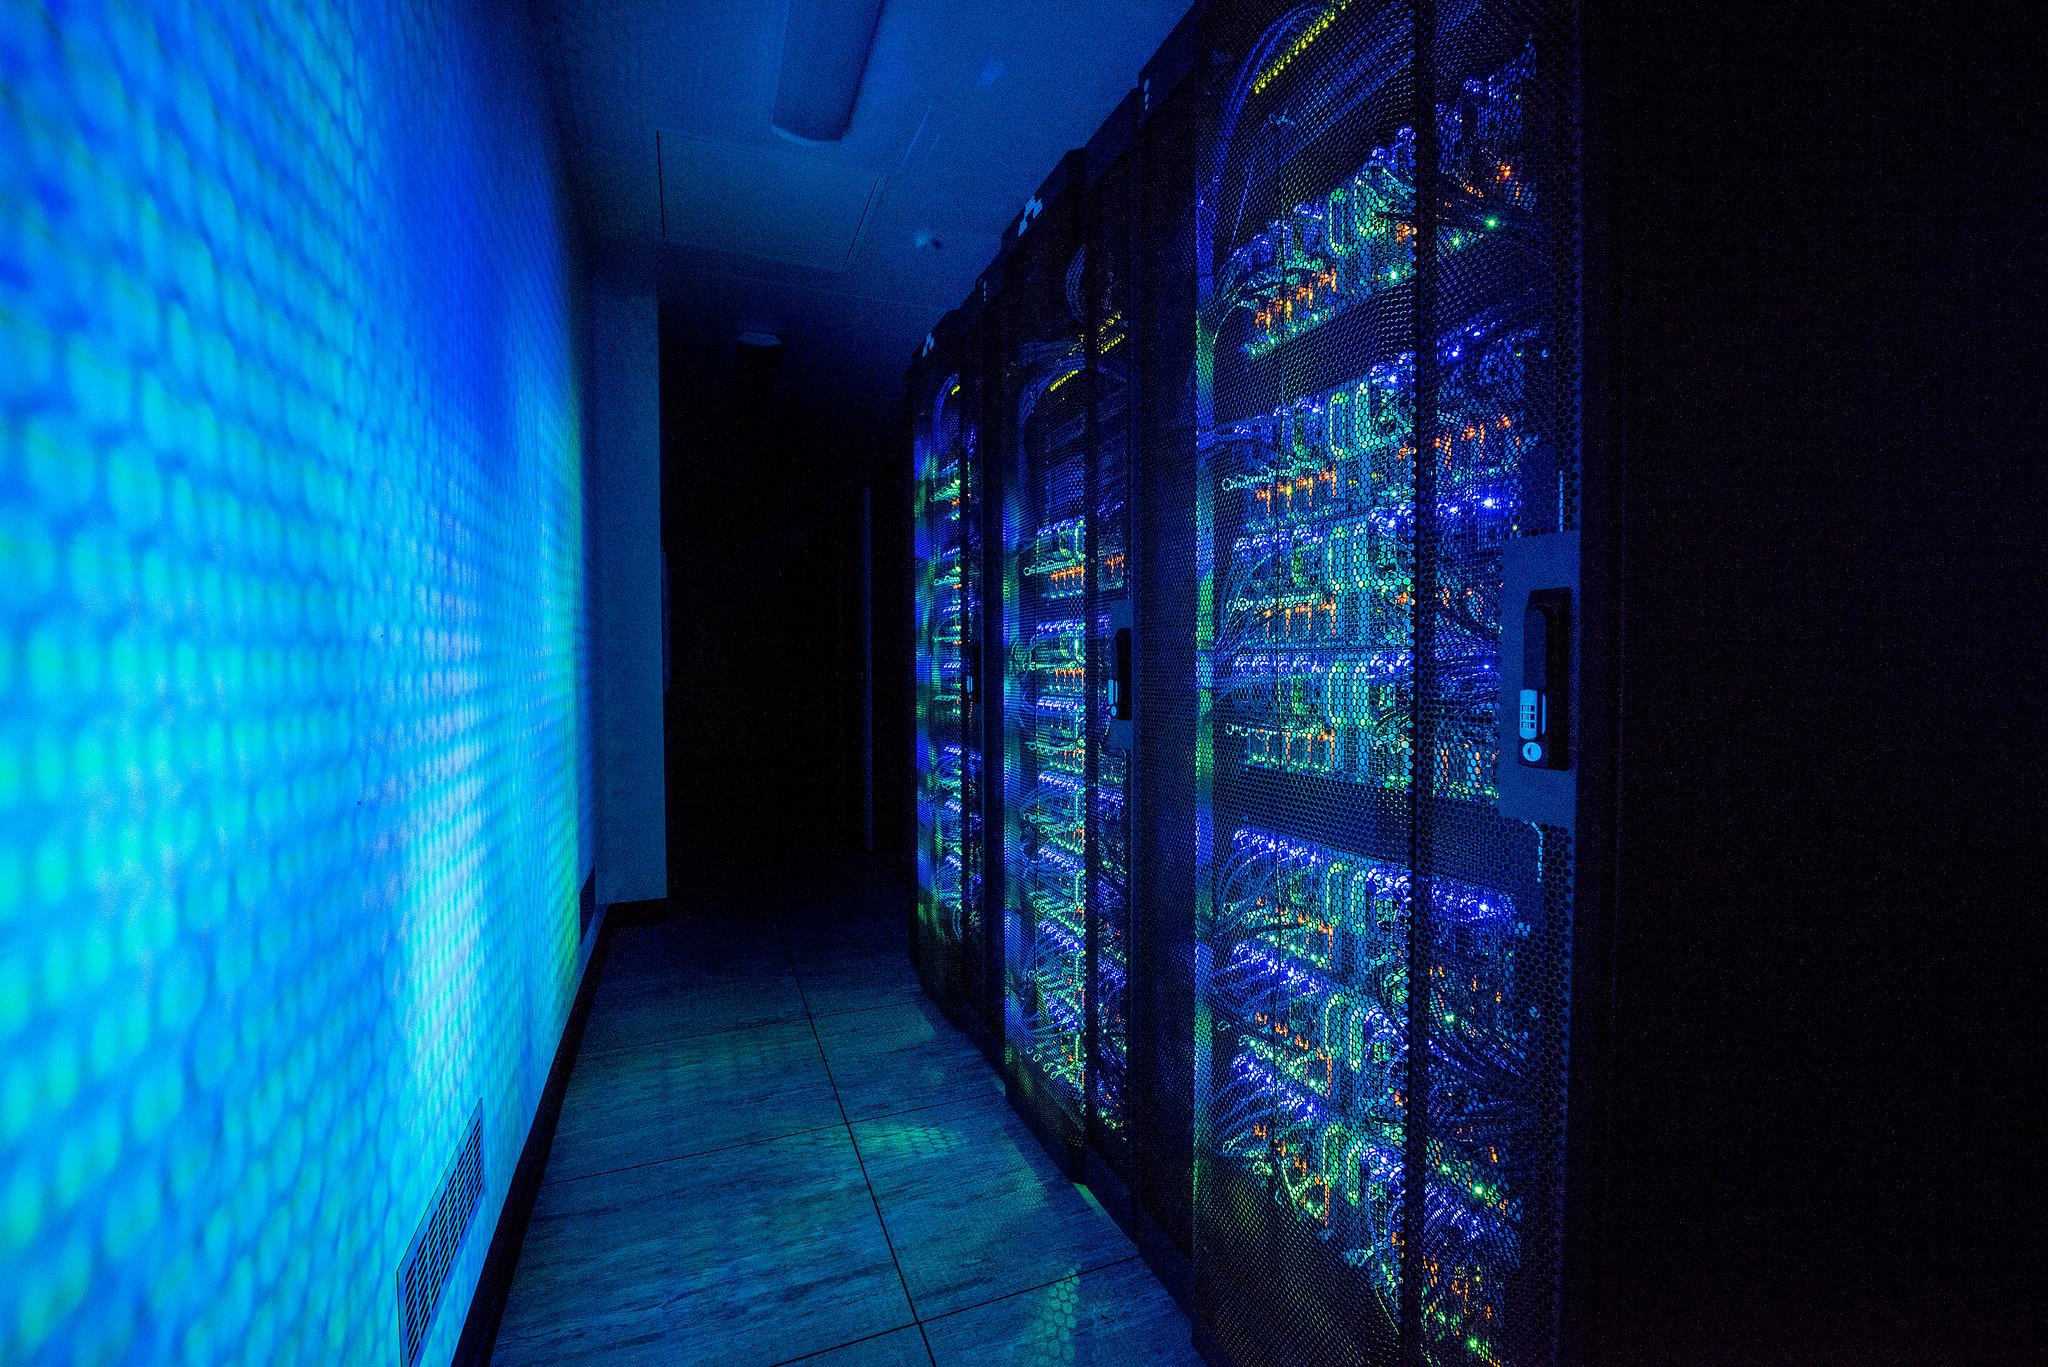 The Balena High Performance Computing HPC system